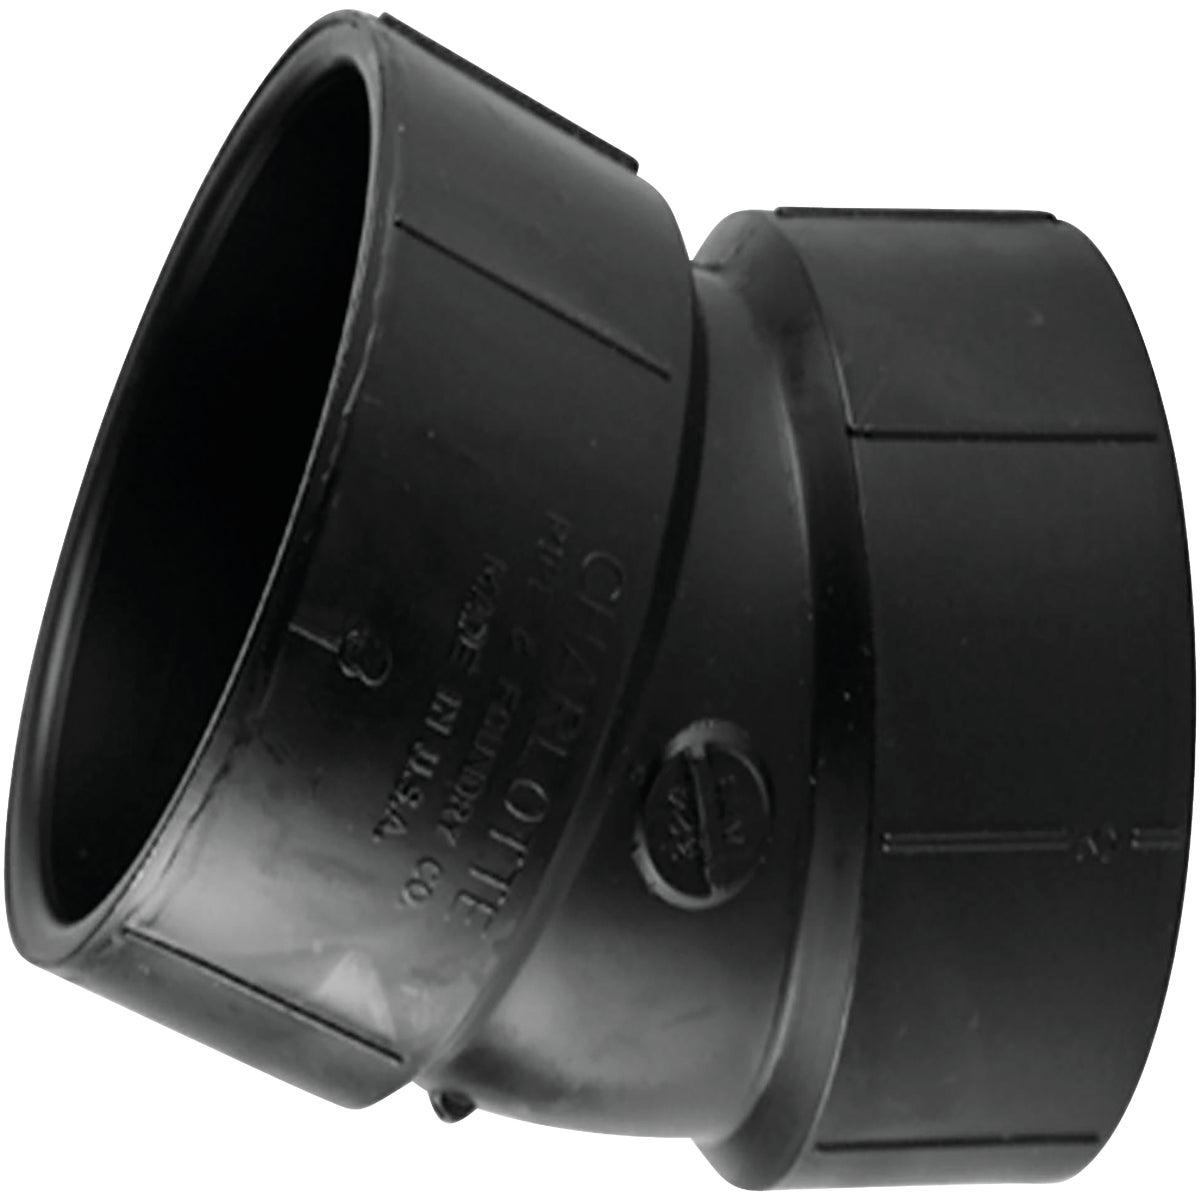 Genova Products 80840 ABS-DWV 22-1/2-Degree Elbows, 4